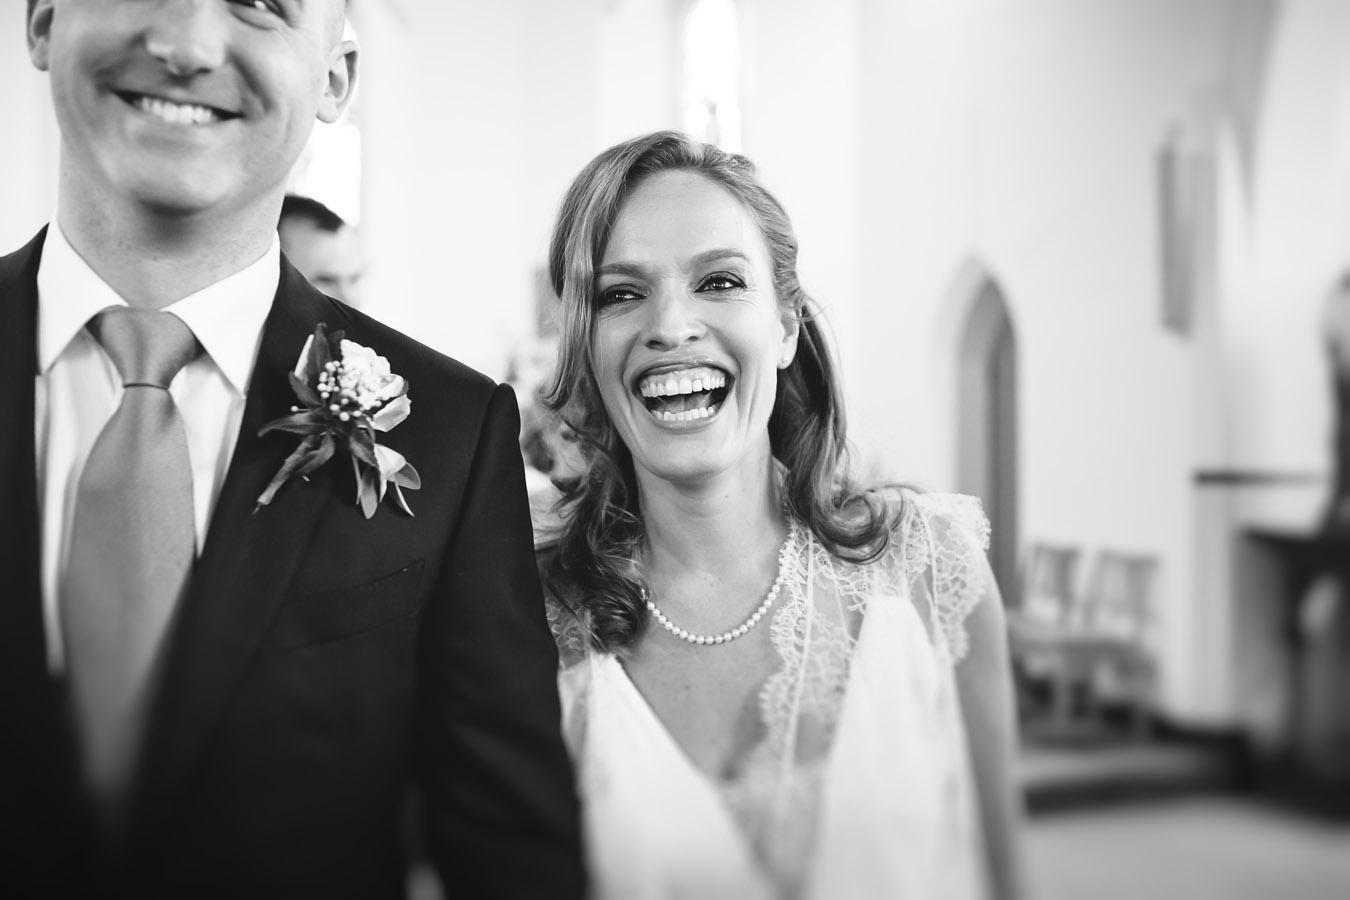 Kerry Ireland wedding photographer